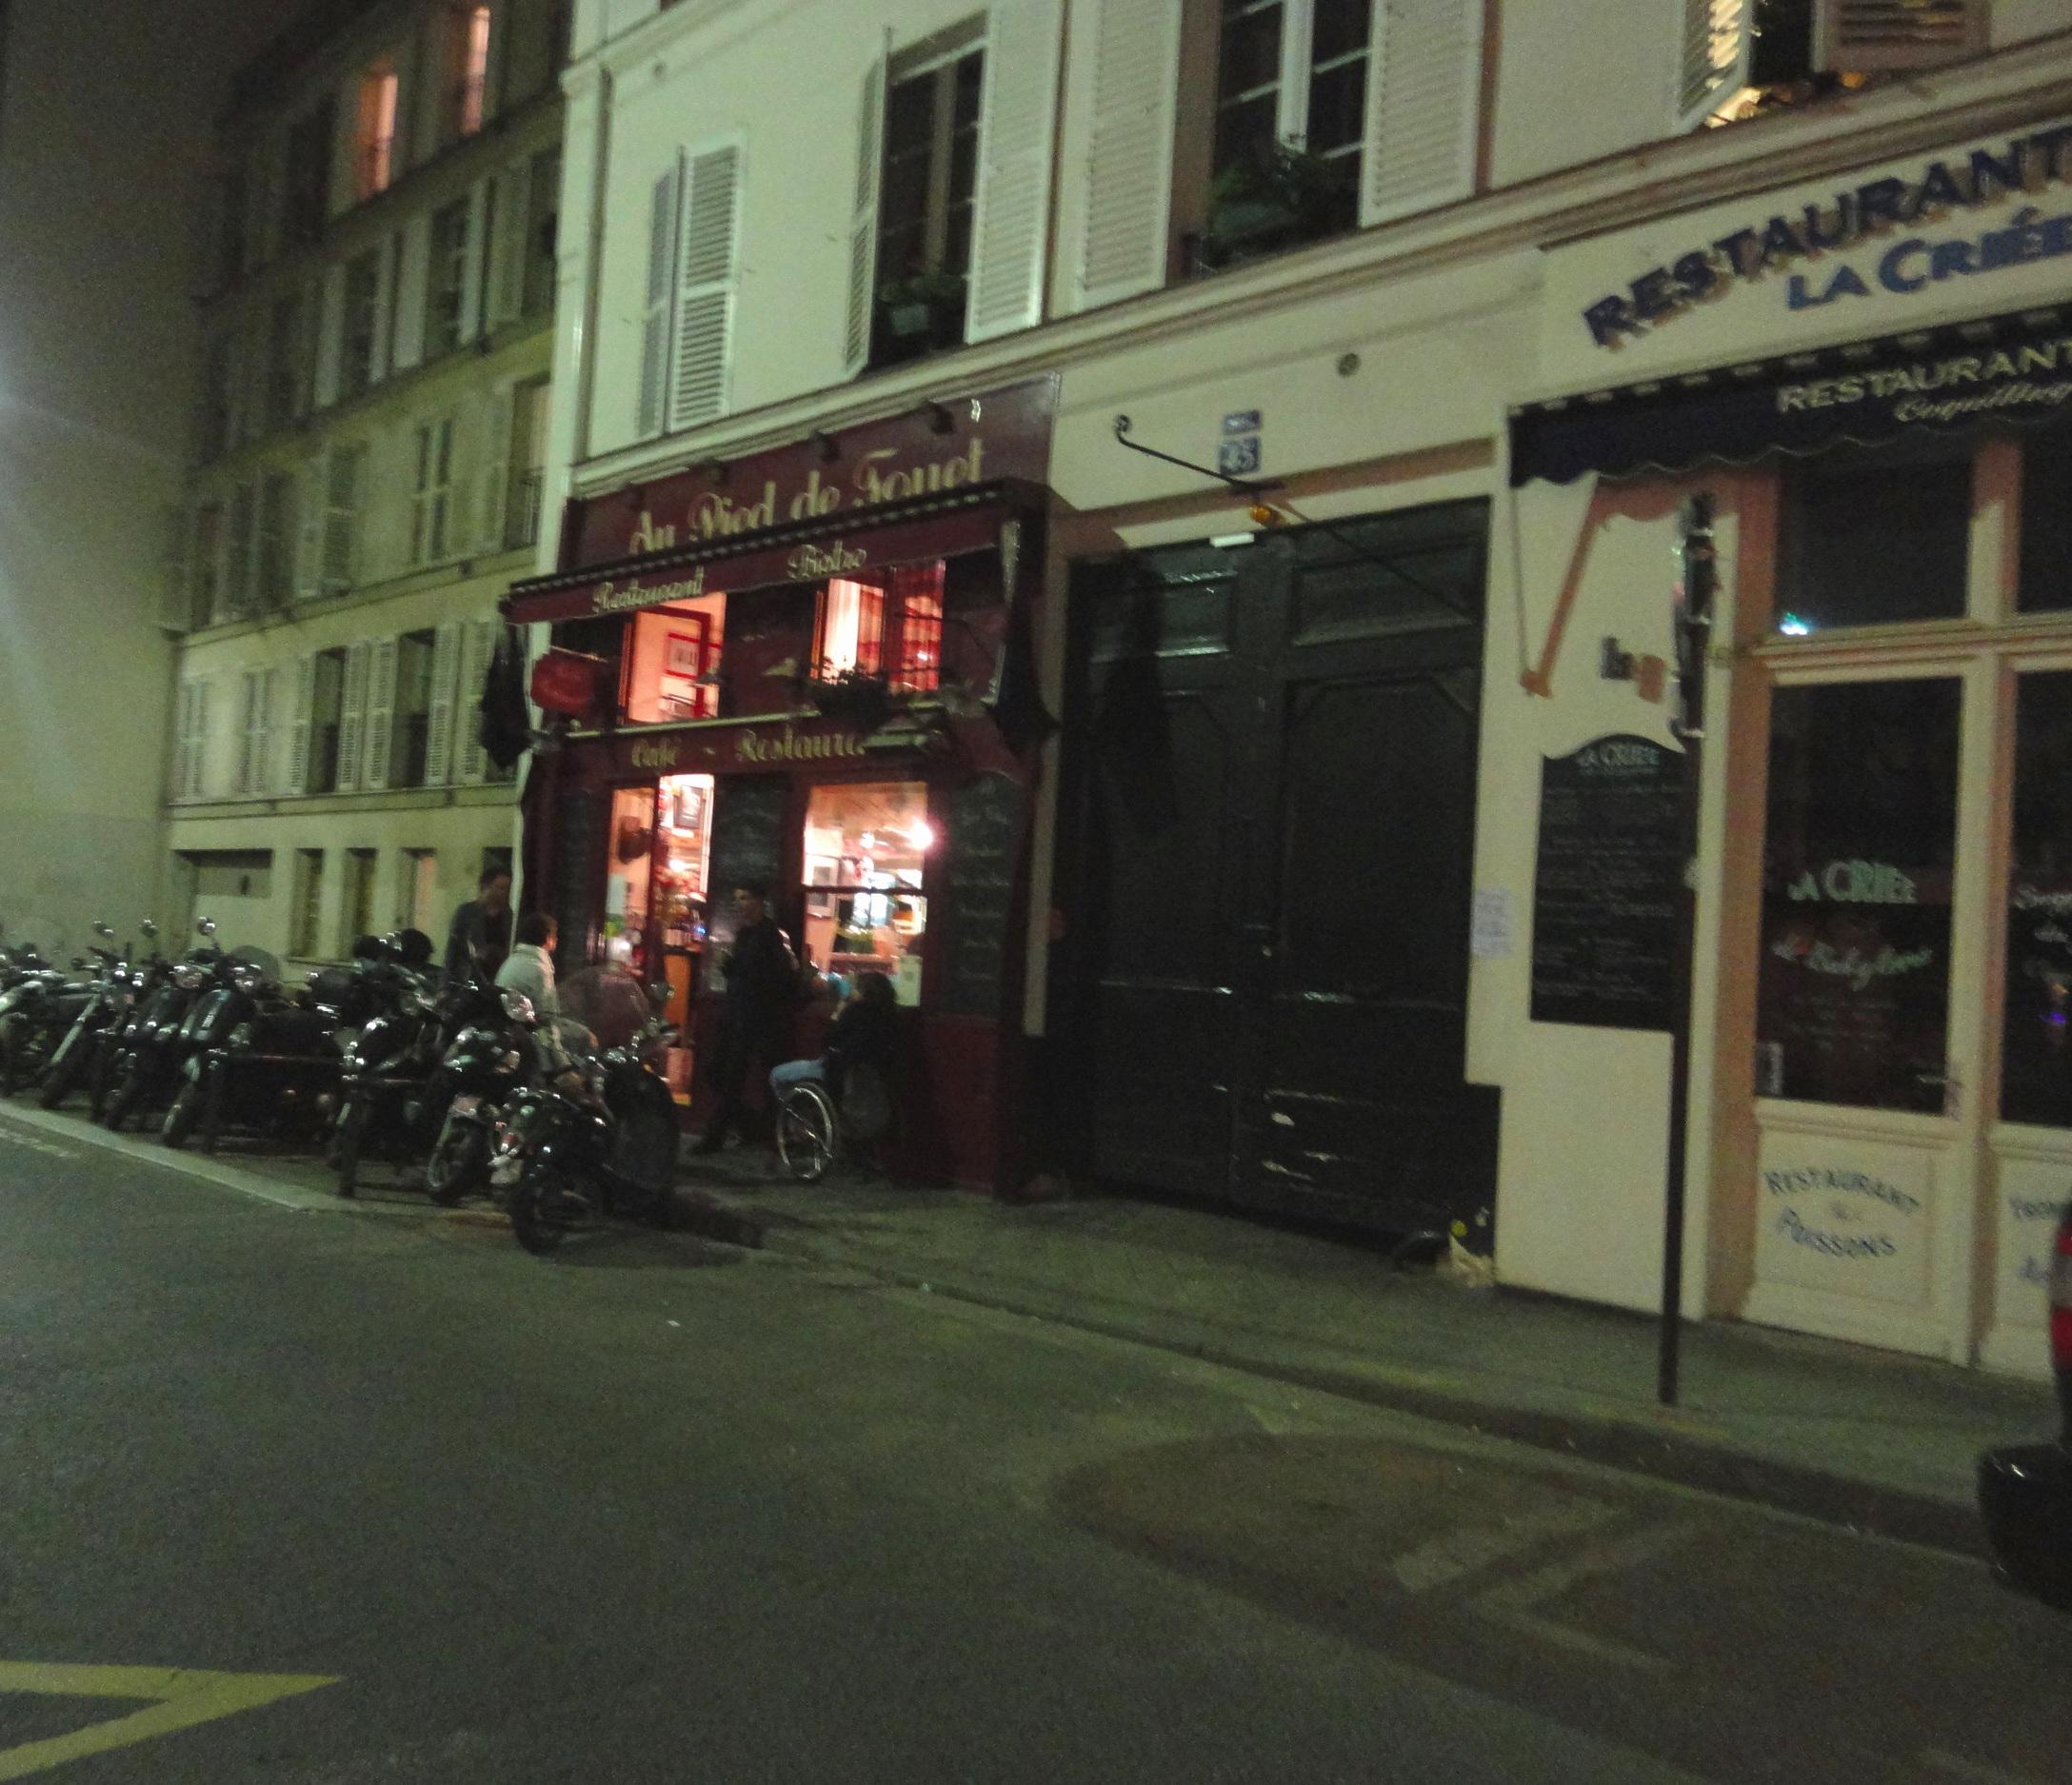 Au Pied de Jouet - Best French restaurant in France